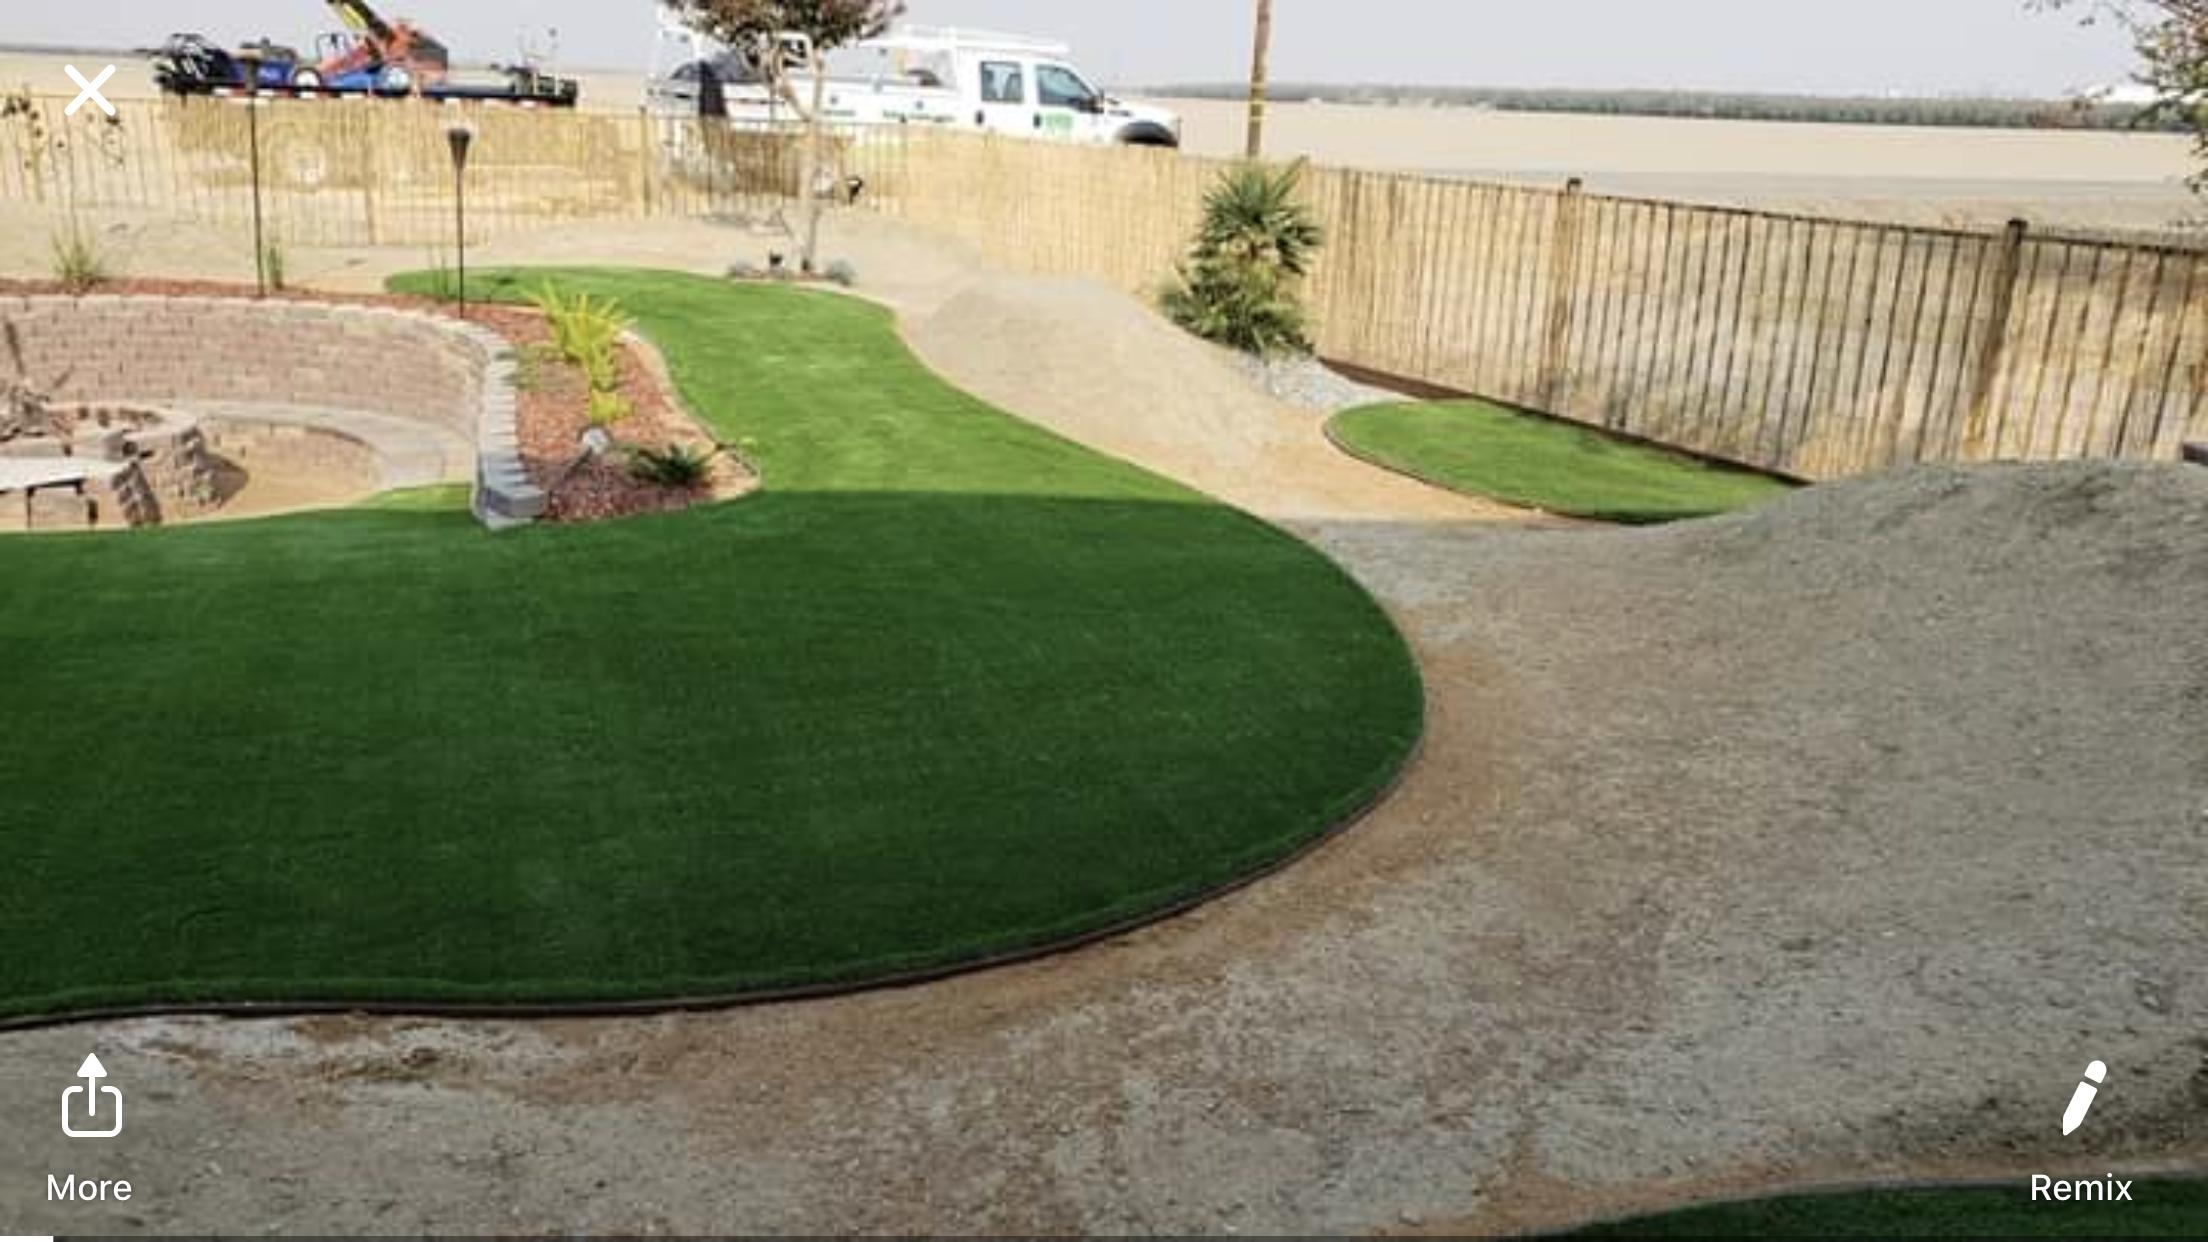 Premium M Blade-80 fake grass for yard,backyard turf,turf backyard,turf yard,fake grass for backyard,fake grass for yard,backyard turf,turf backyard,turf yard,fake grass for backyard